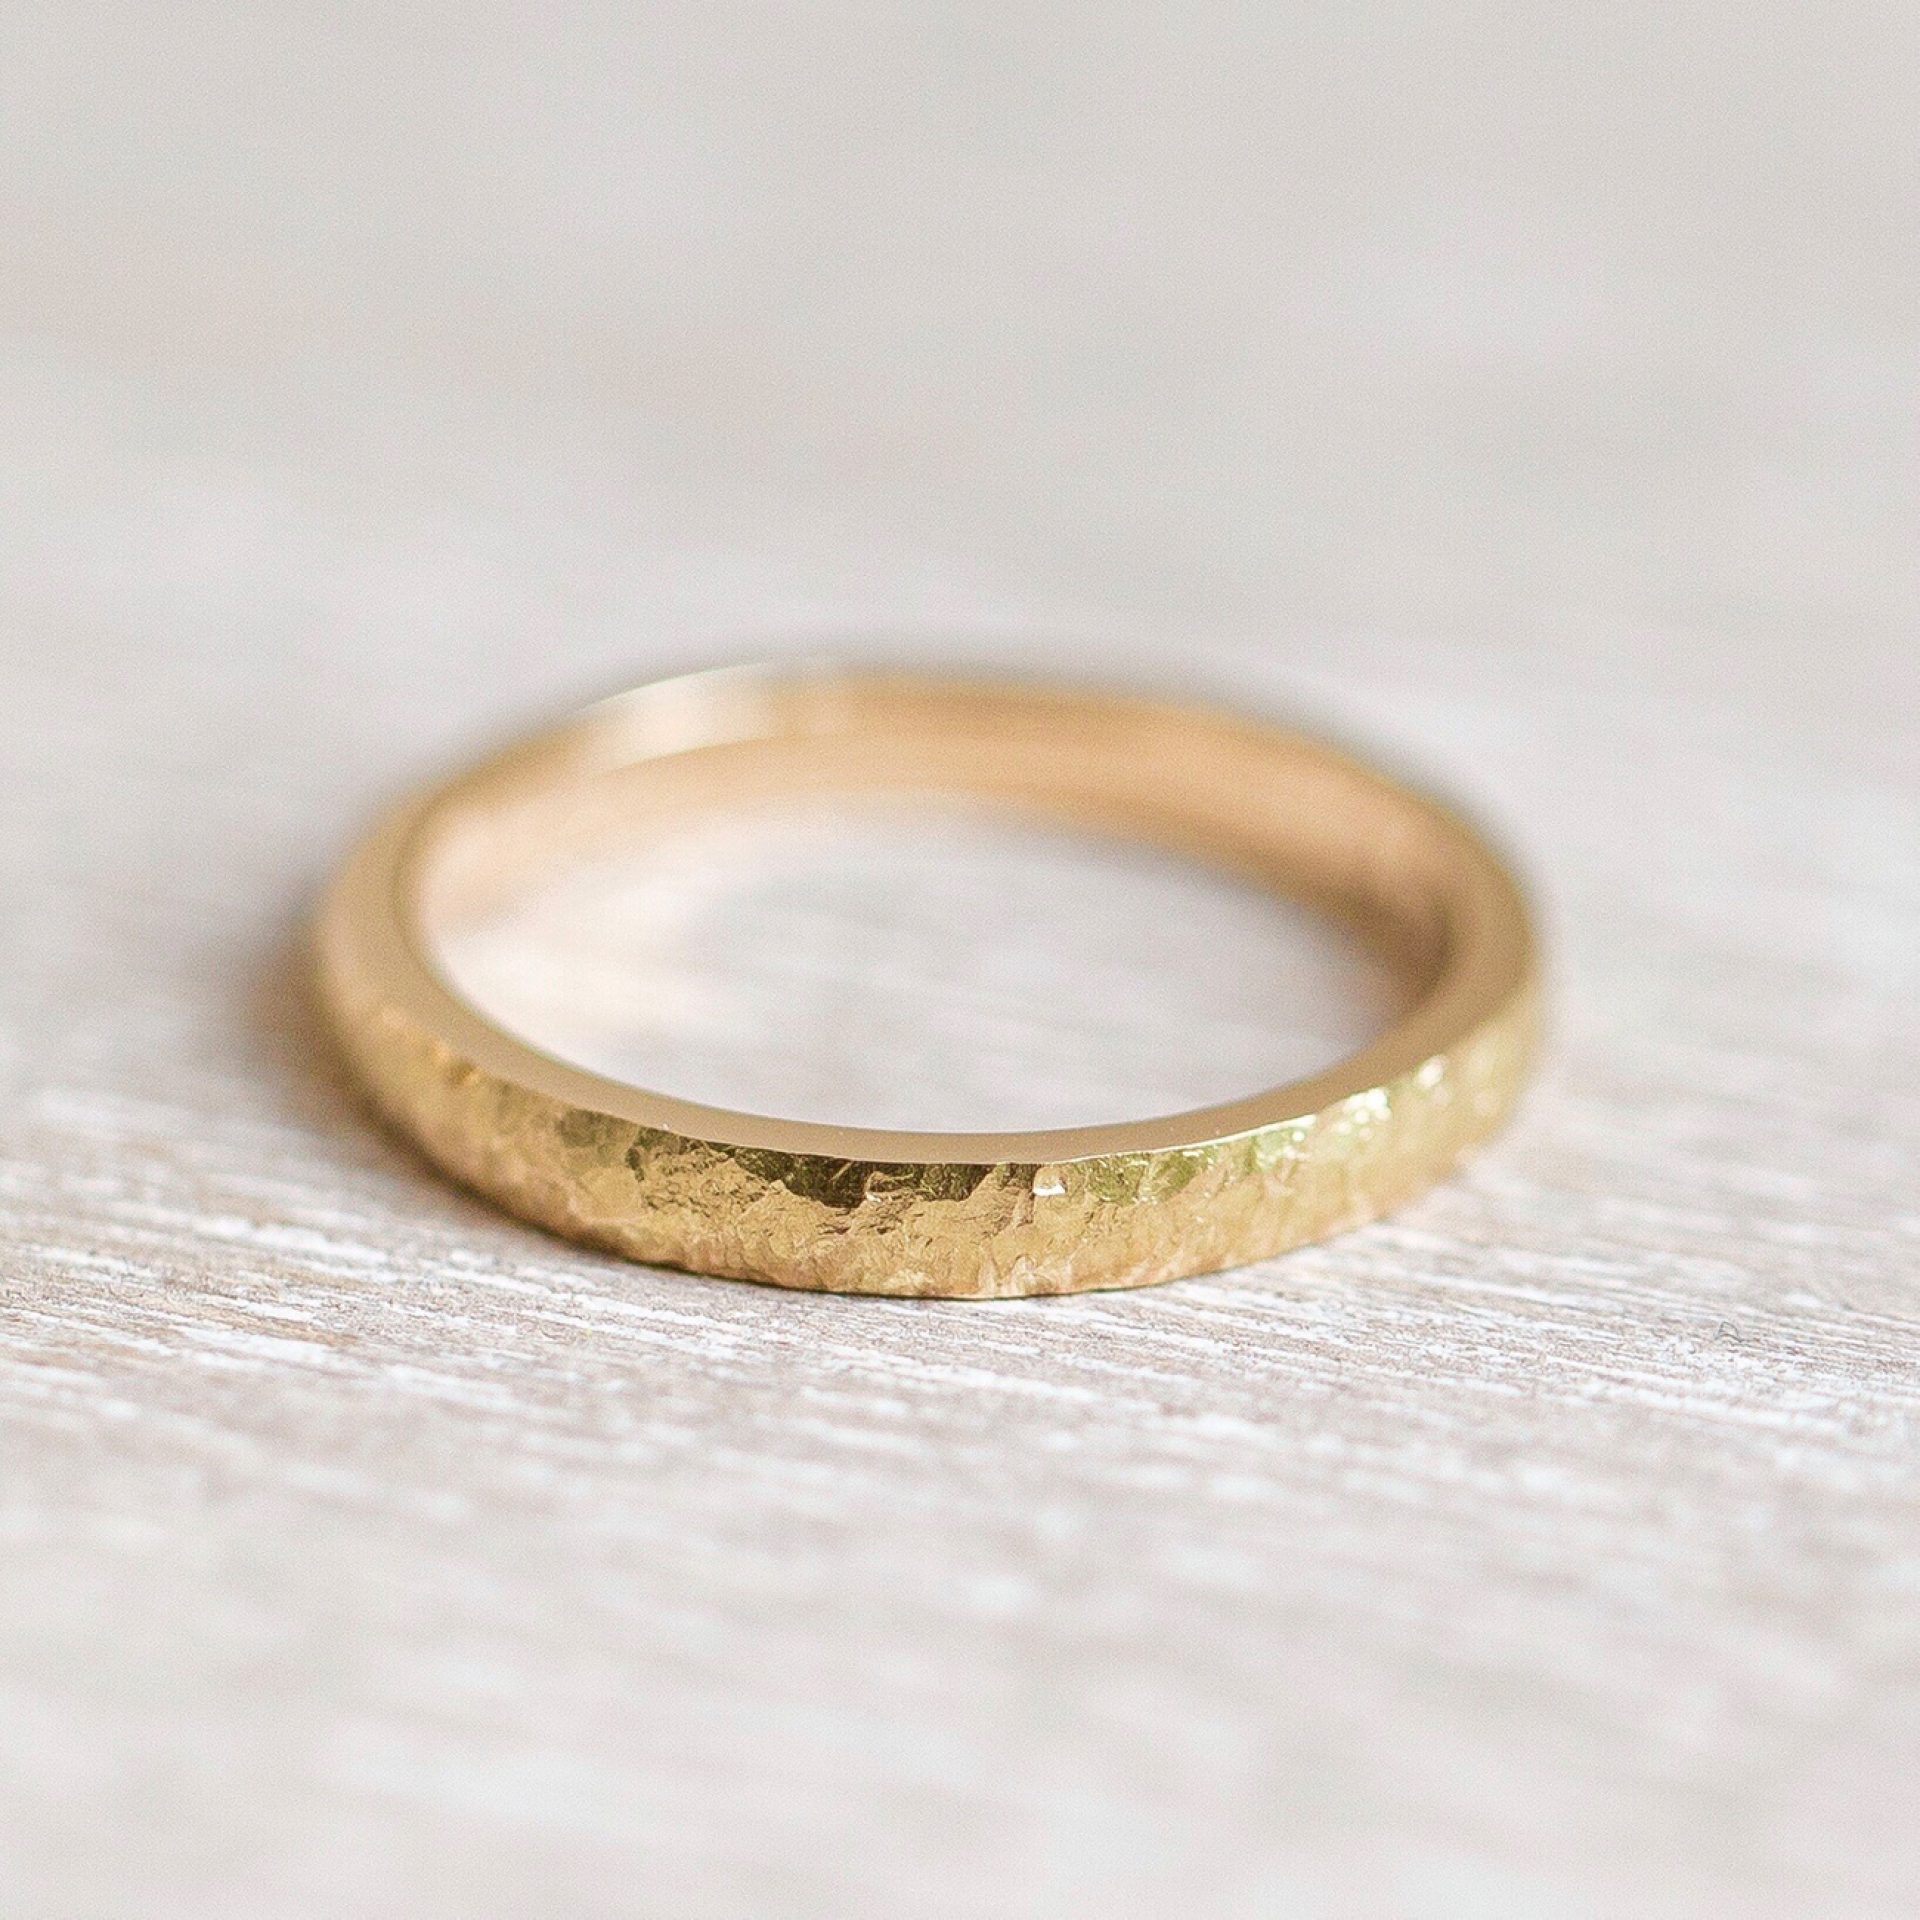 Damen Ehering filigran Gold Weissgold Rosegold